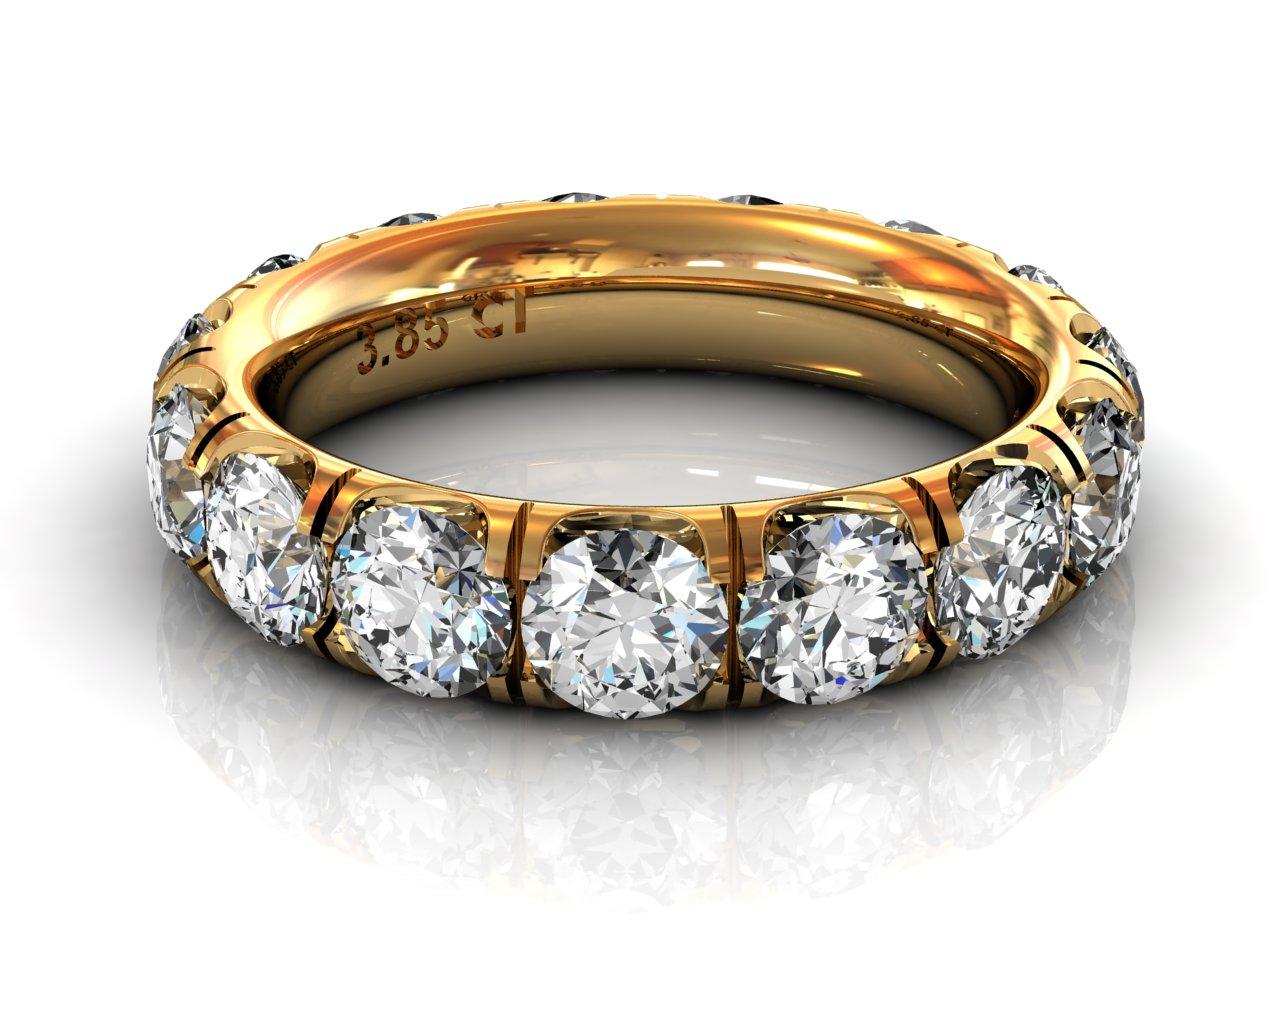 Wedding Bands Ladies Diamonds Craponia Setting 15 Stone 3.85 TCW Diamonds 4.60g 18kt Yelllow Gold